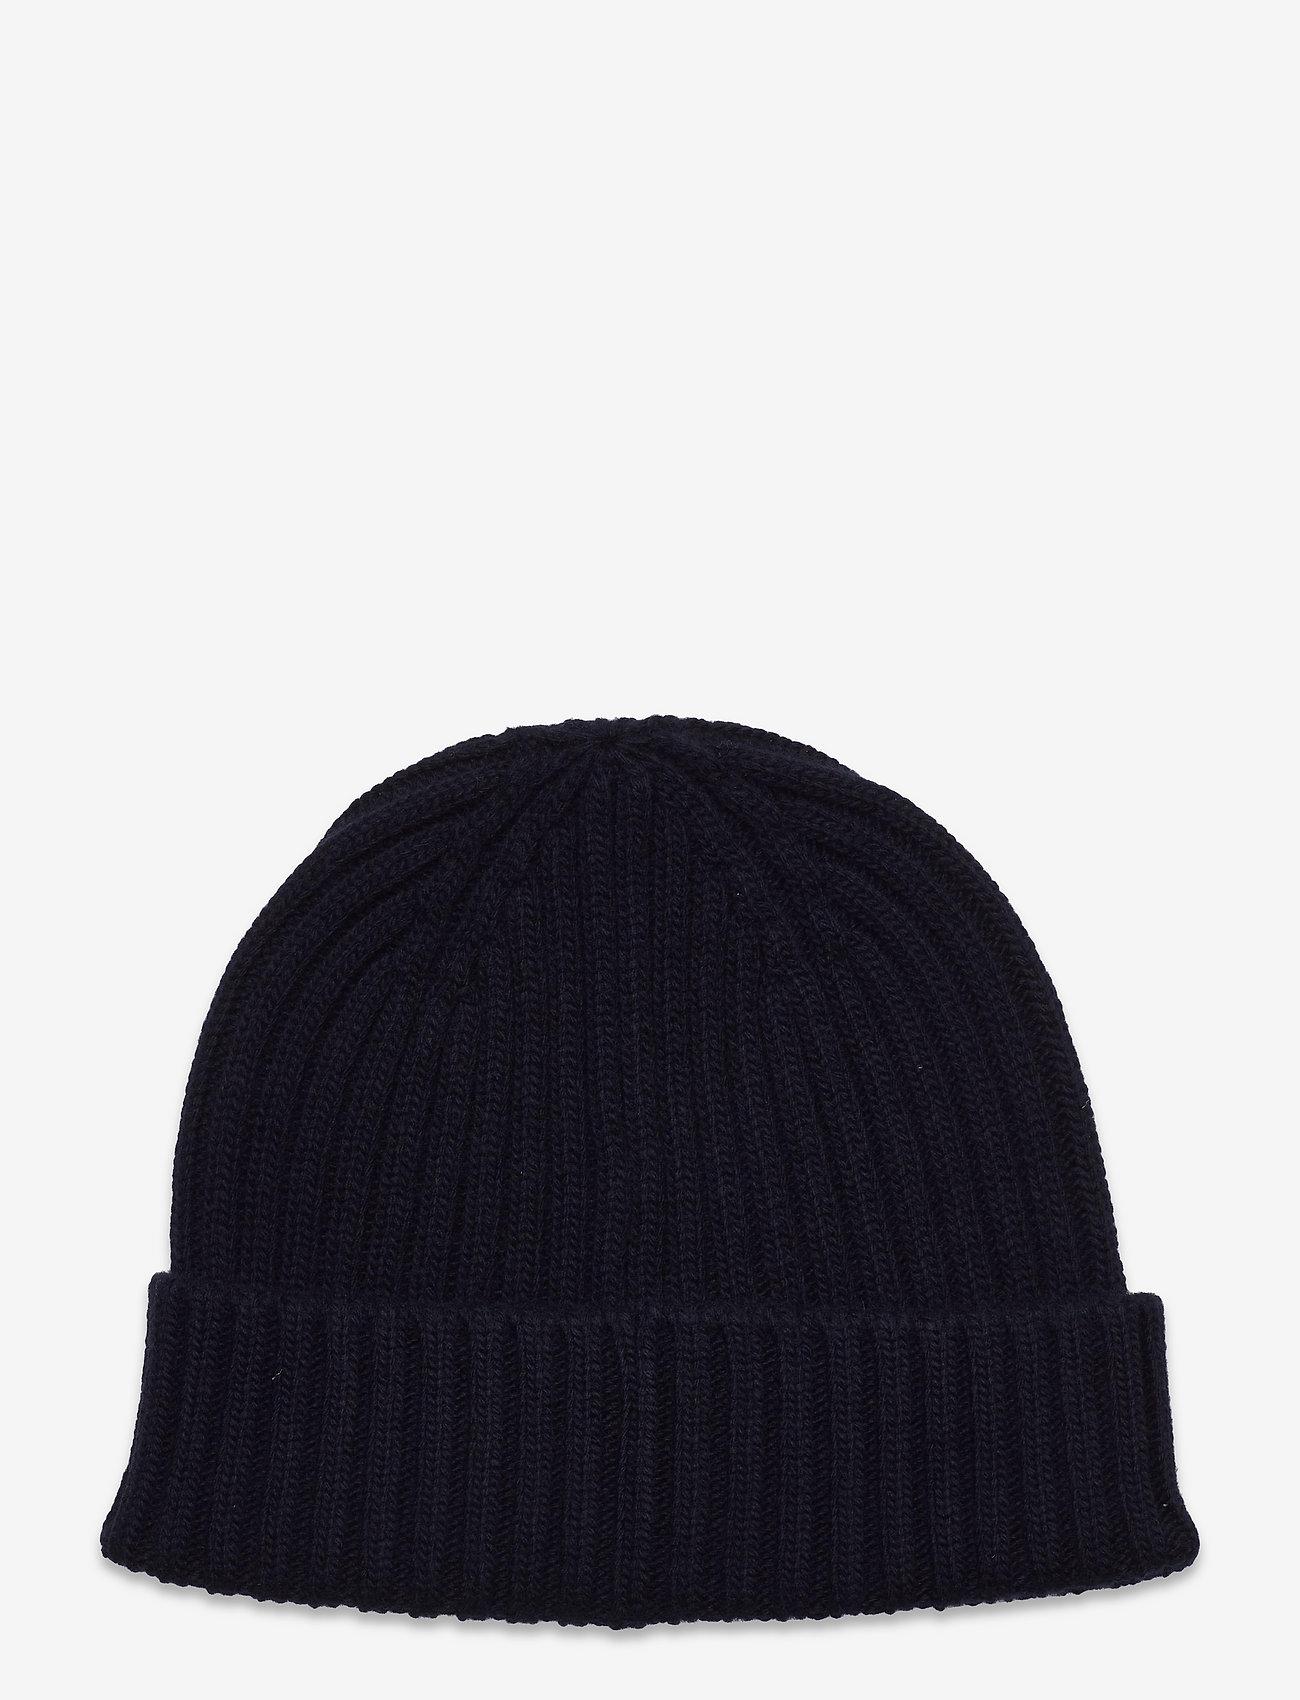 Belstaff - WATCH HAT W/PATCH - bonnets & casquettes - dark navy - 1